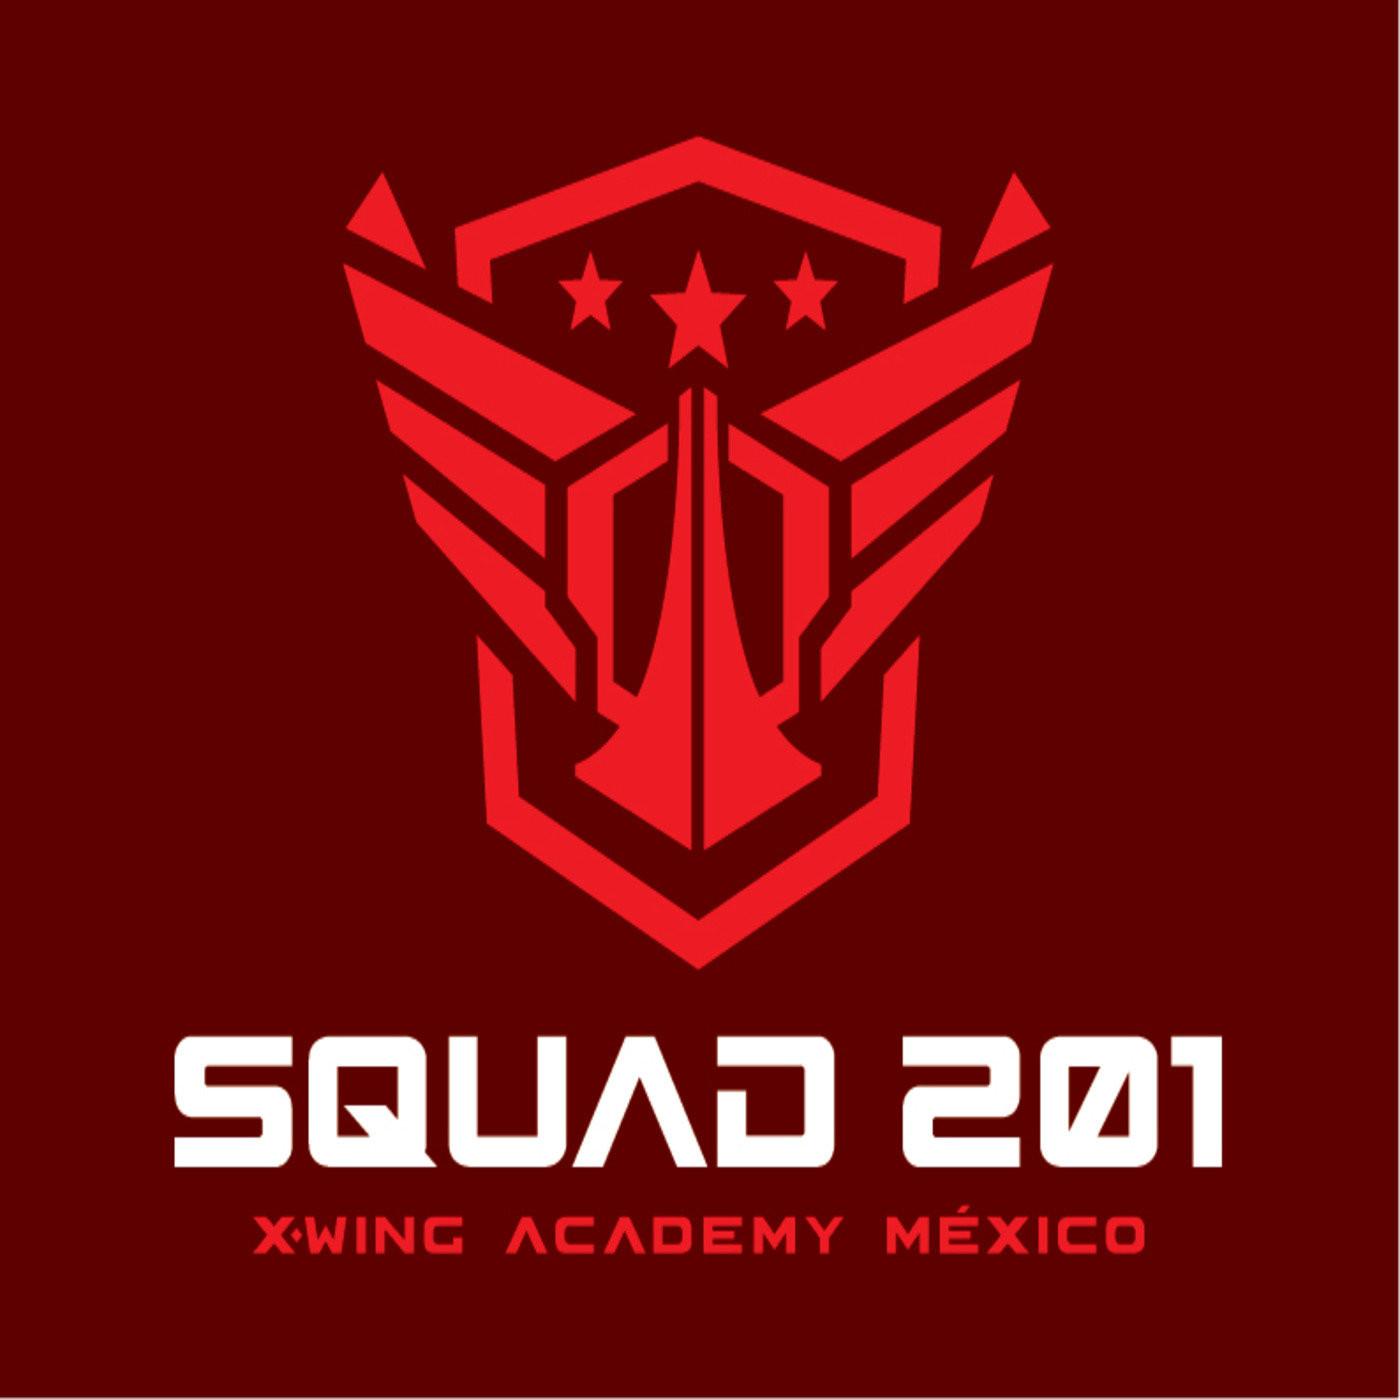 <![CDATA[Squad 201: X-Wing Academy México]]>